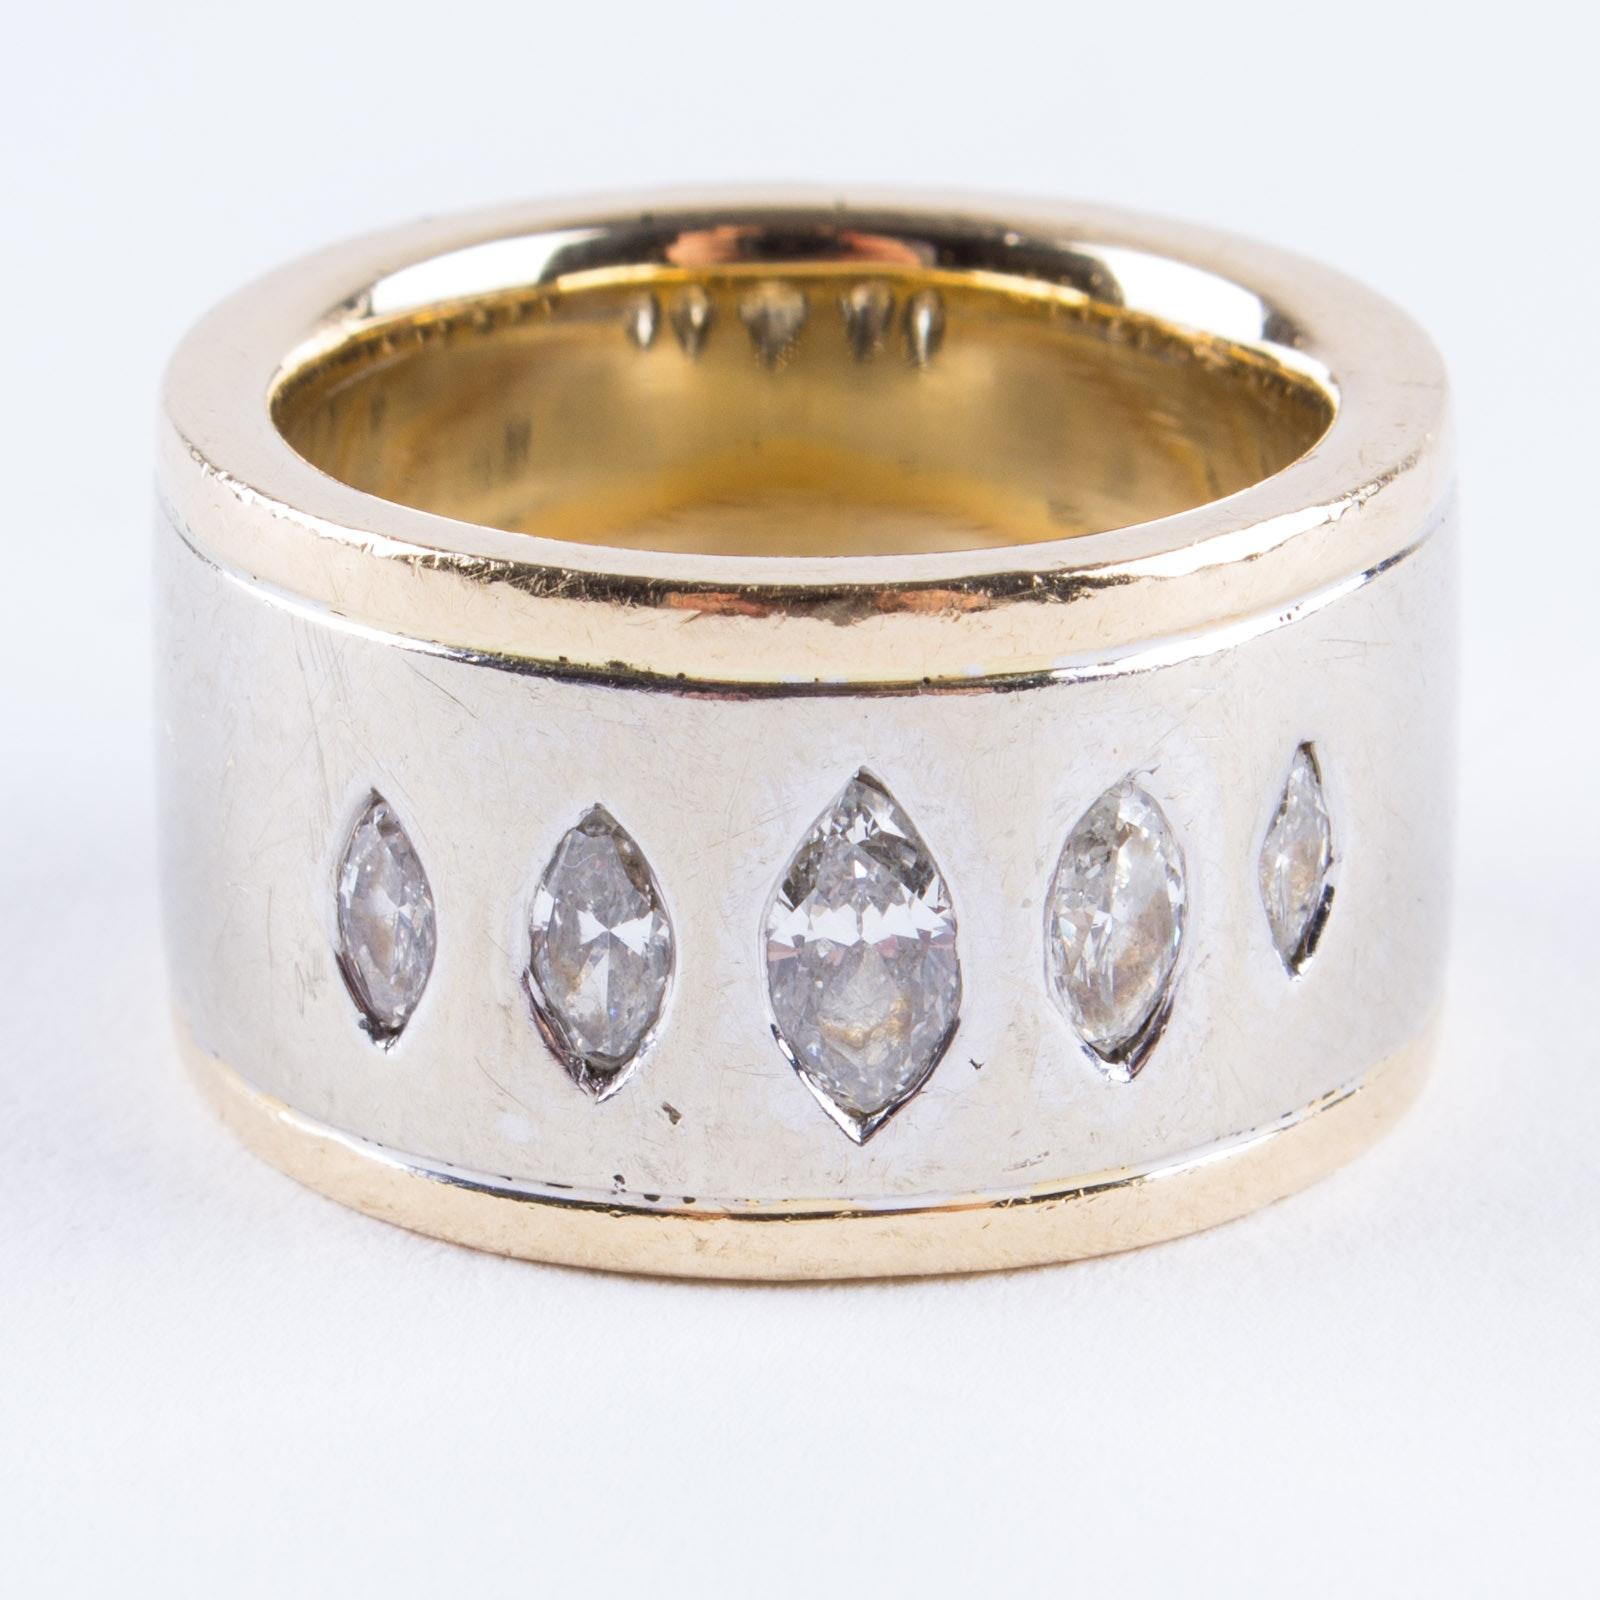 14K Yellow Gold Marquise Diamond Band